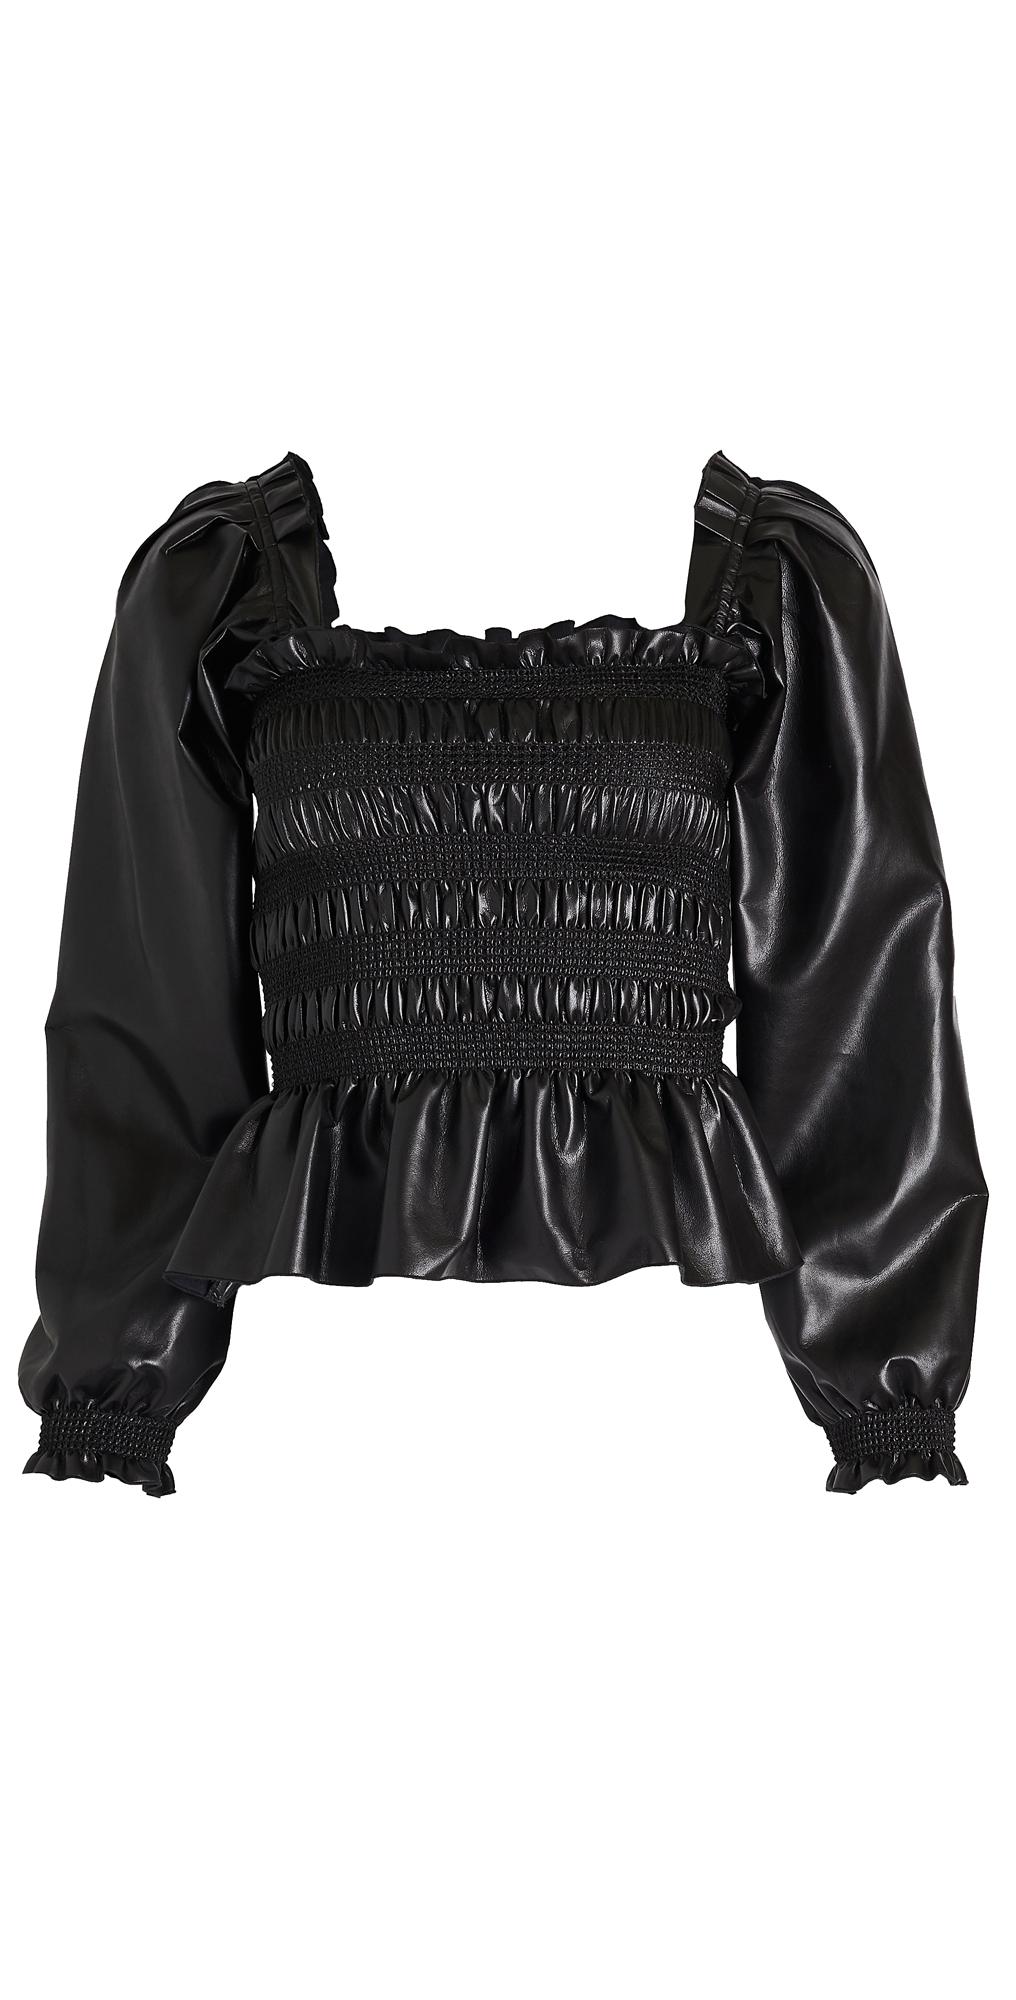 Philosophy di Lorenzo Serafini Faux Leather Blouse